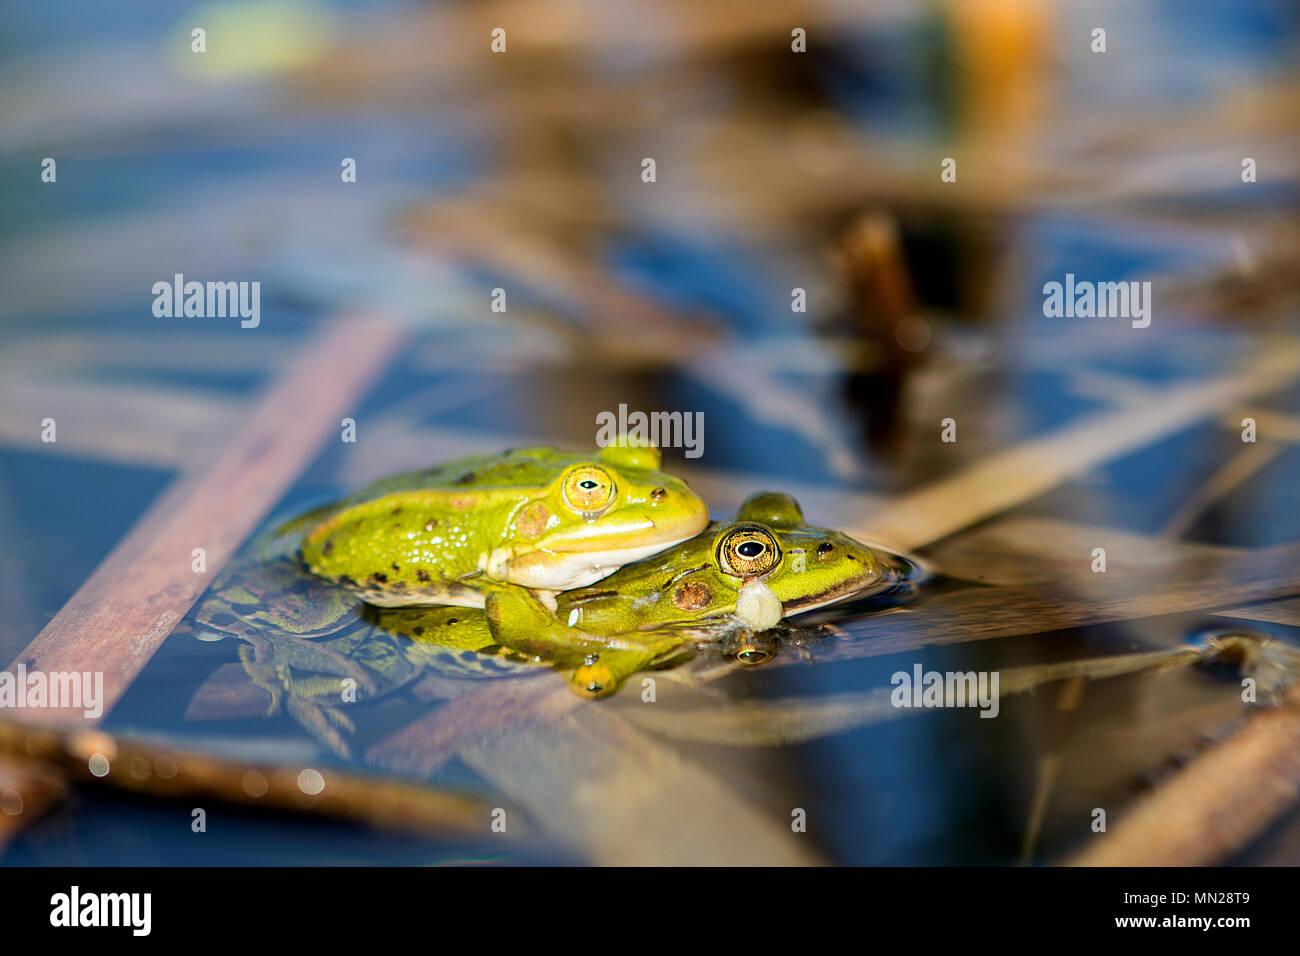 Green frogs  (Pelophylax kl.Esculentus) in springtime - Stock Image